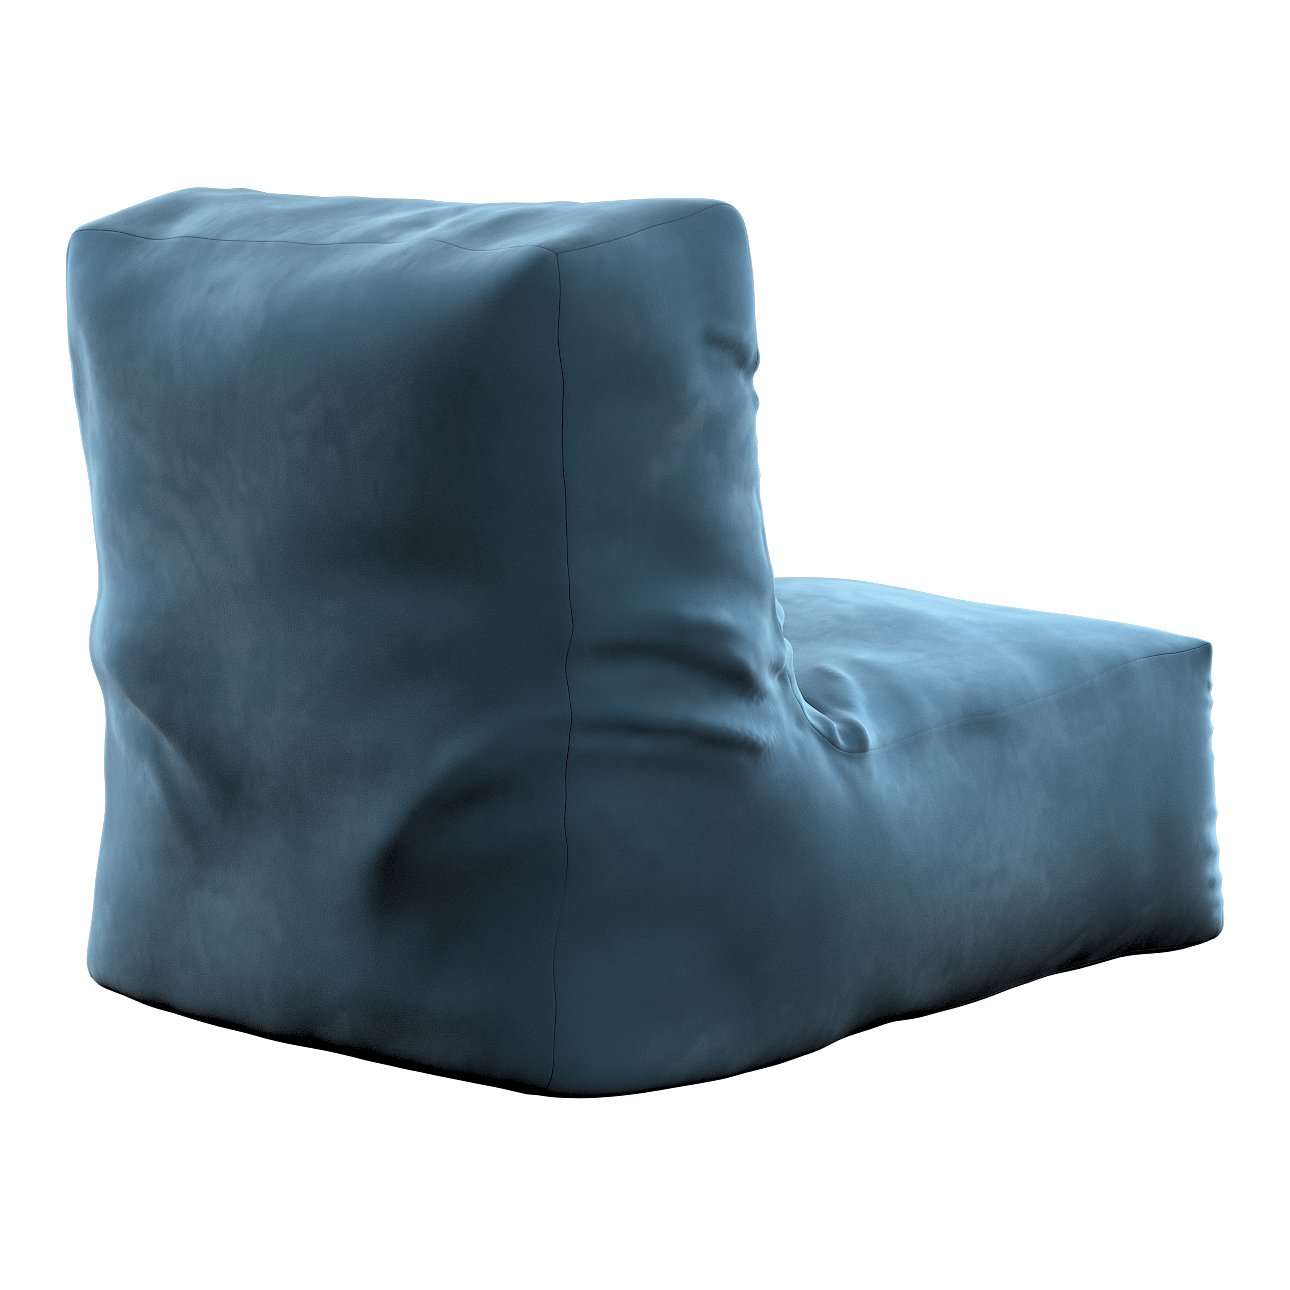 Pufa- fotel w kolekcji Velvet, tkanina: 704-16